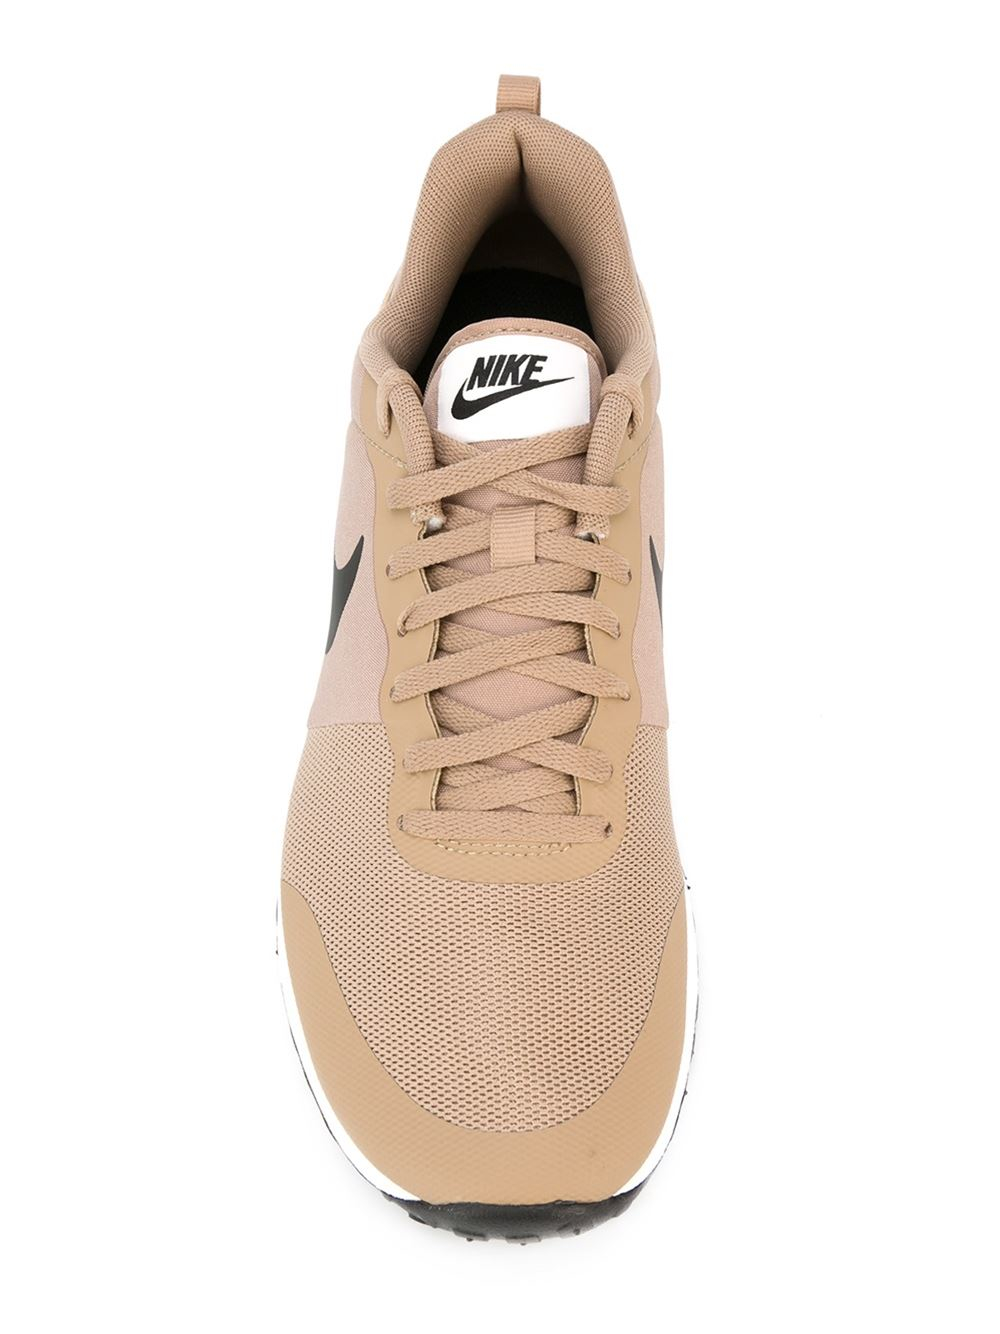 Levántate Generosidad Ejecutar  Nike Elite Shinsen Suede Sneakers in Natural for Men - Lyst